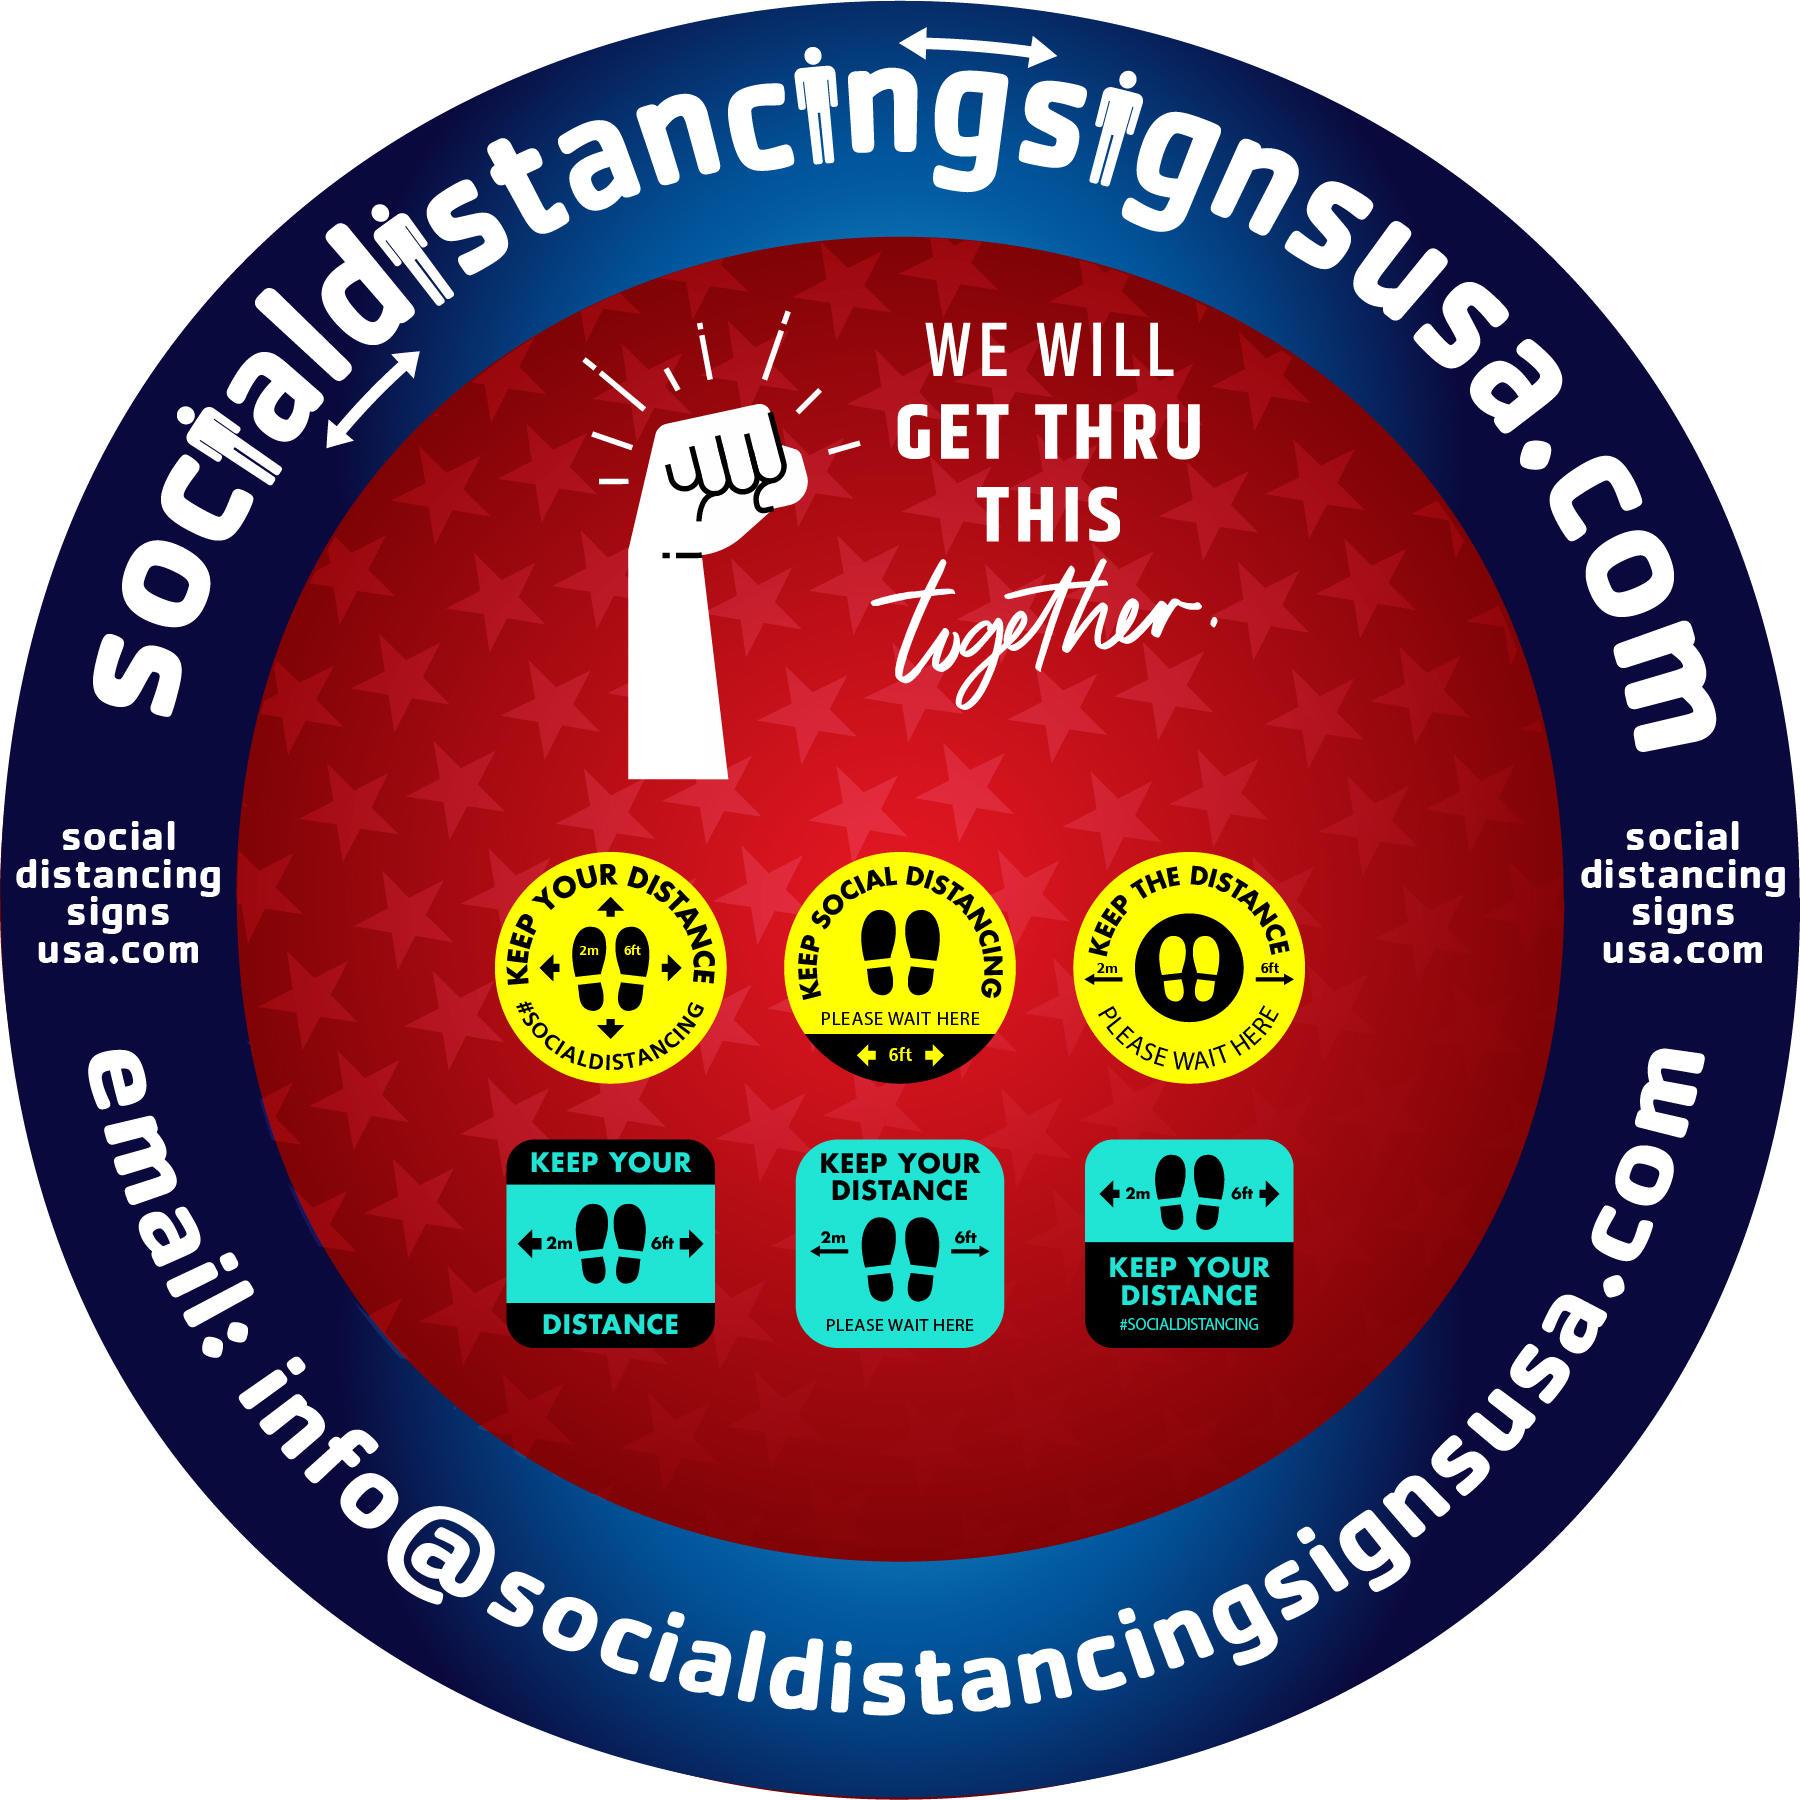 Social Distancing Signs USA